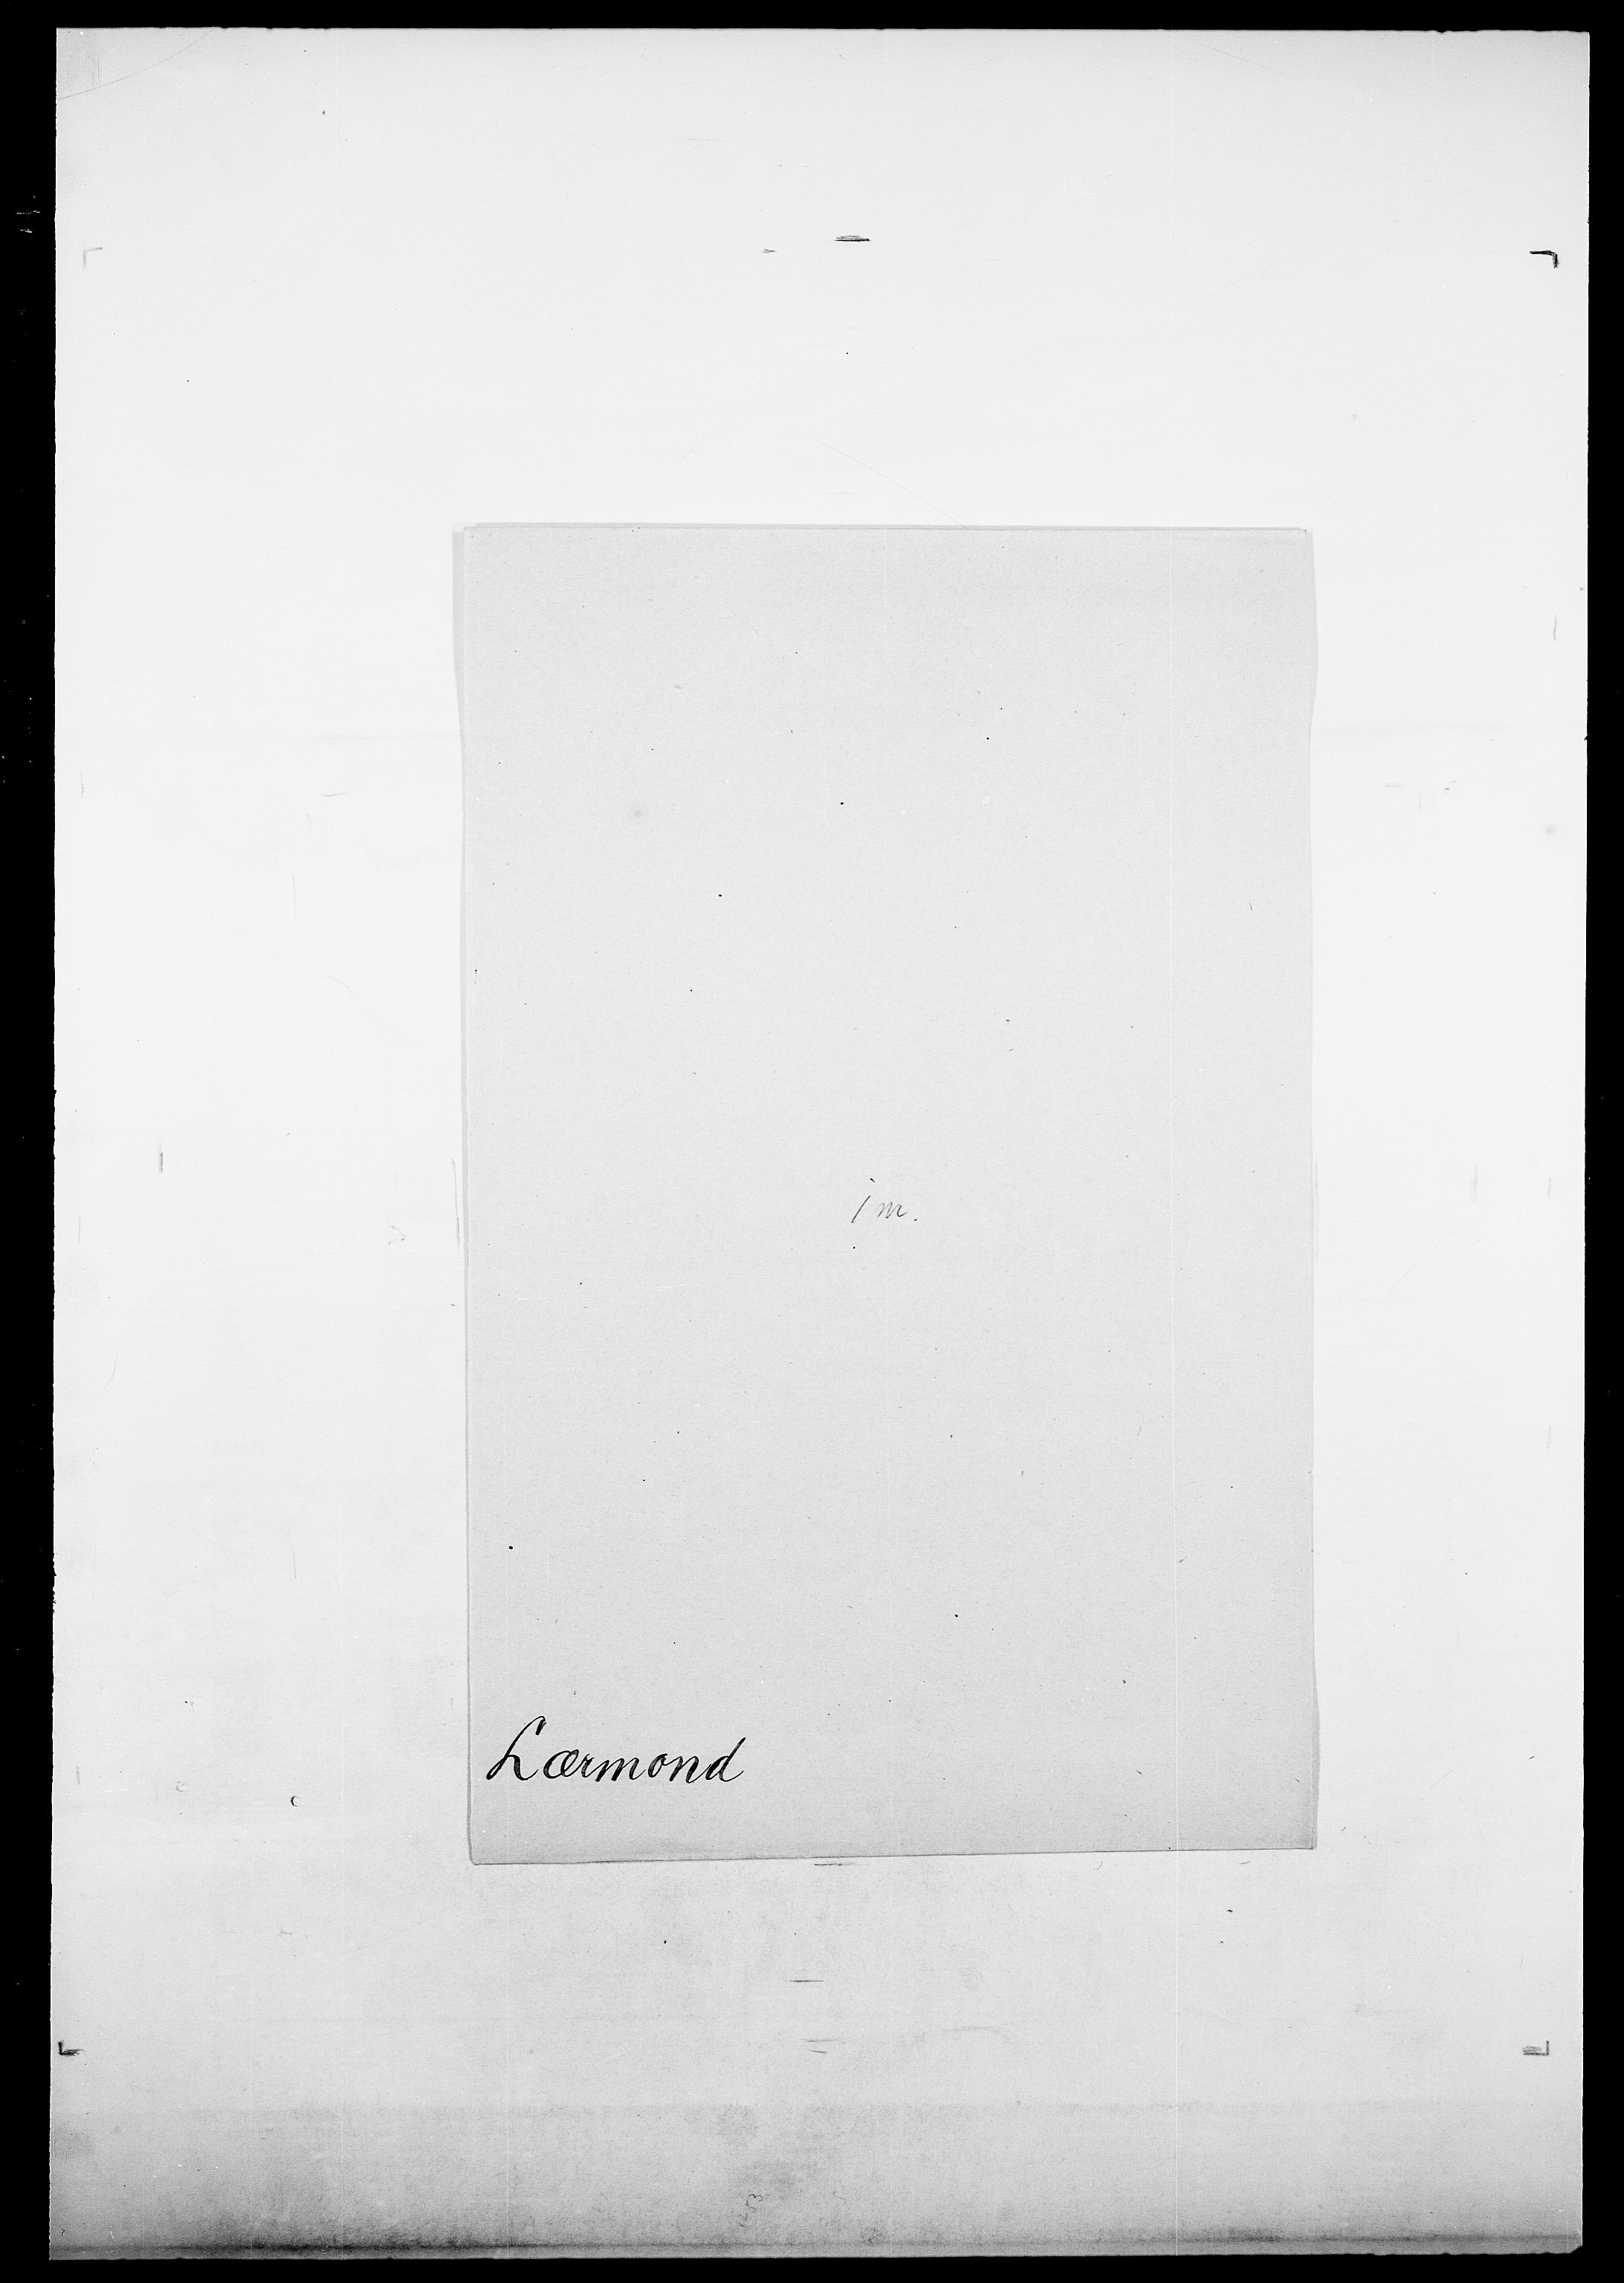 SAO, Delgobe, Charles Antoine - samling, D/Da/L0024: Lobech - Lærum, s. 837